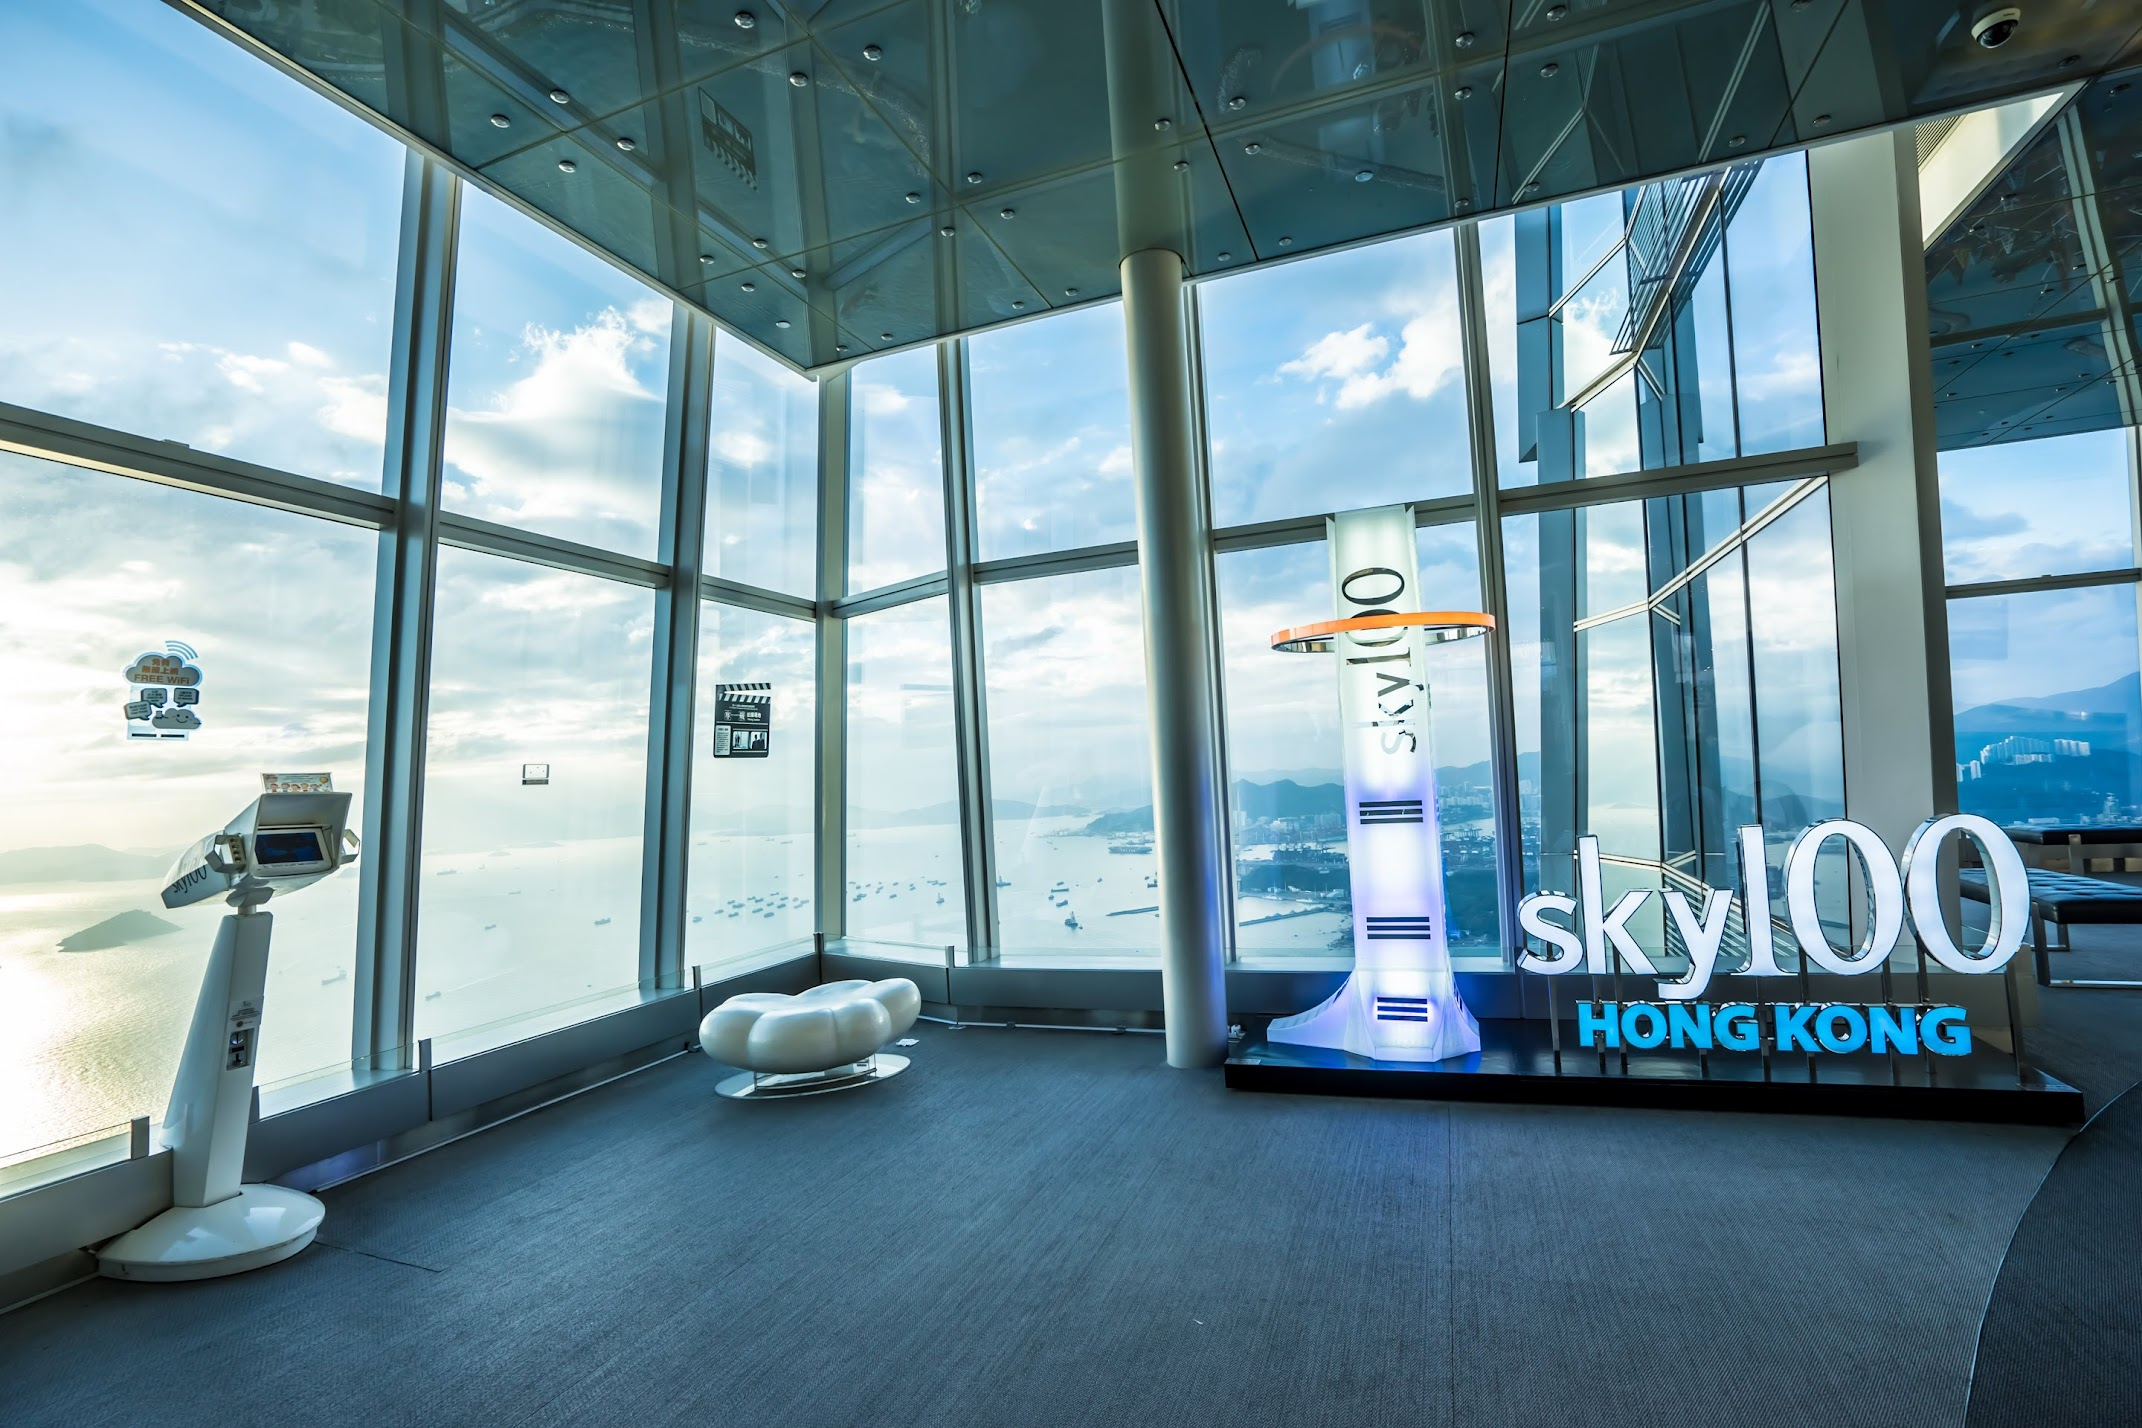 Hong Kong sky100 (天際100)6